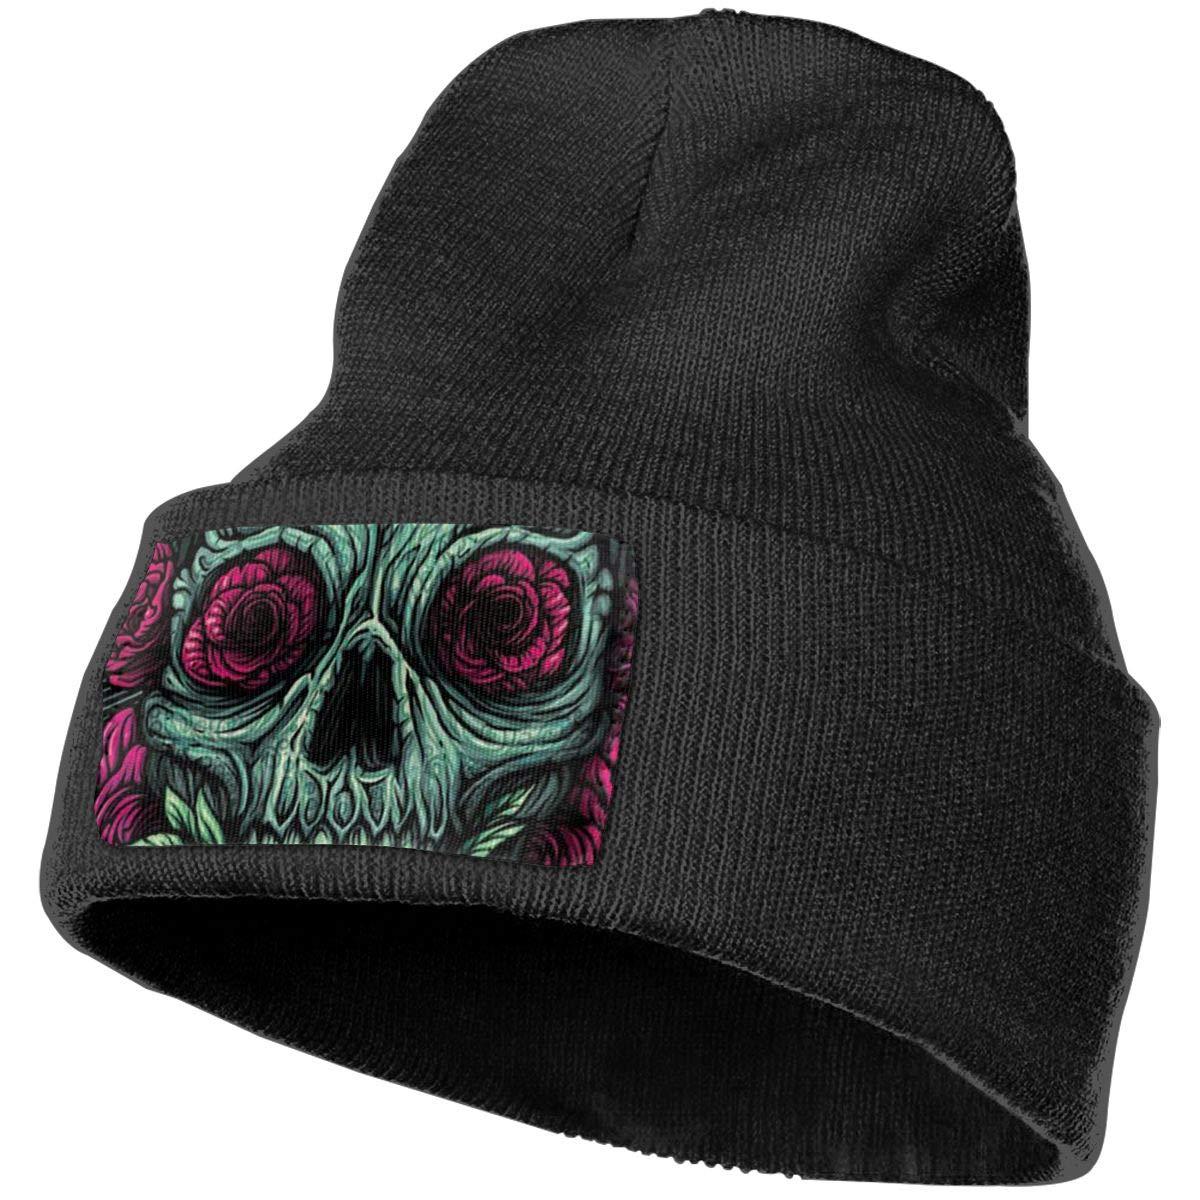 Horizon-t Zombie Skull Unisex 100/% Acrylic Knitting Hat Cap Fashion Beanie Hat